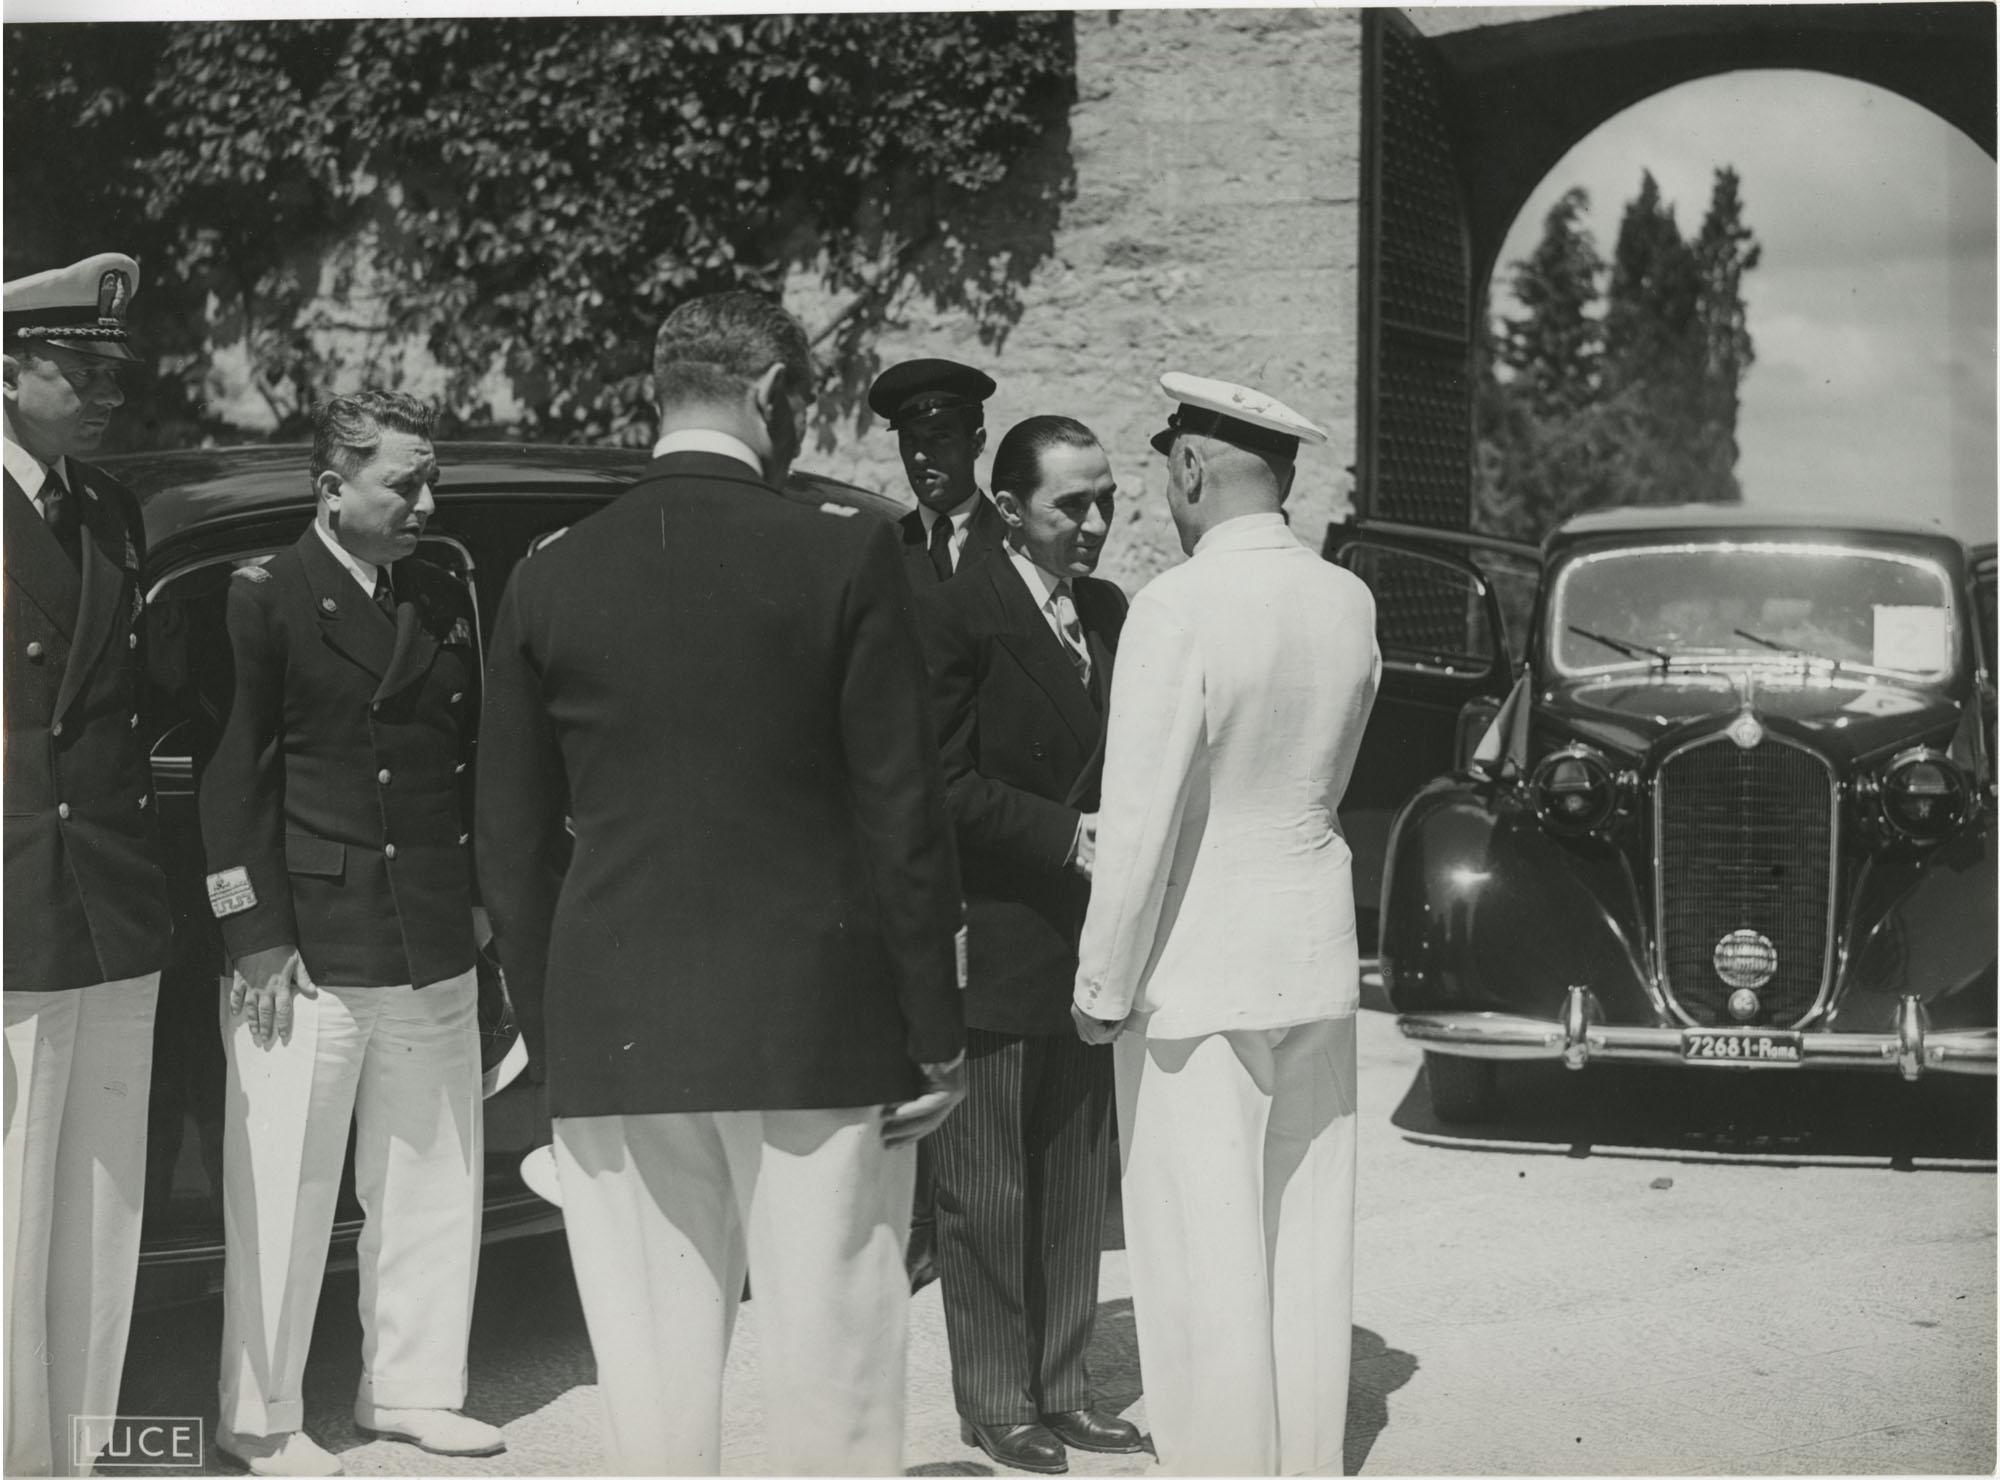 Mihai Antonescu's visit to Benito Mussolini, Photograph 30